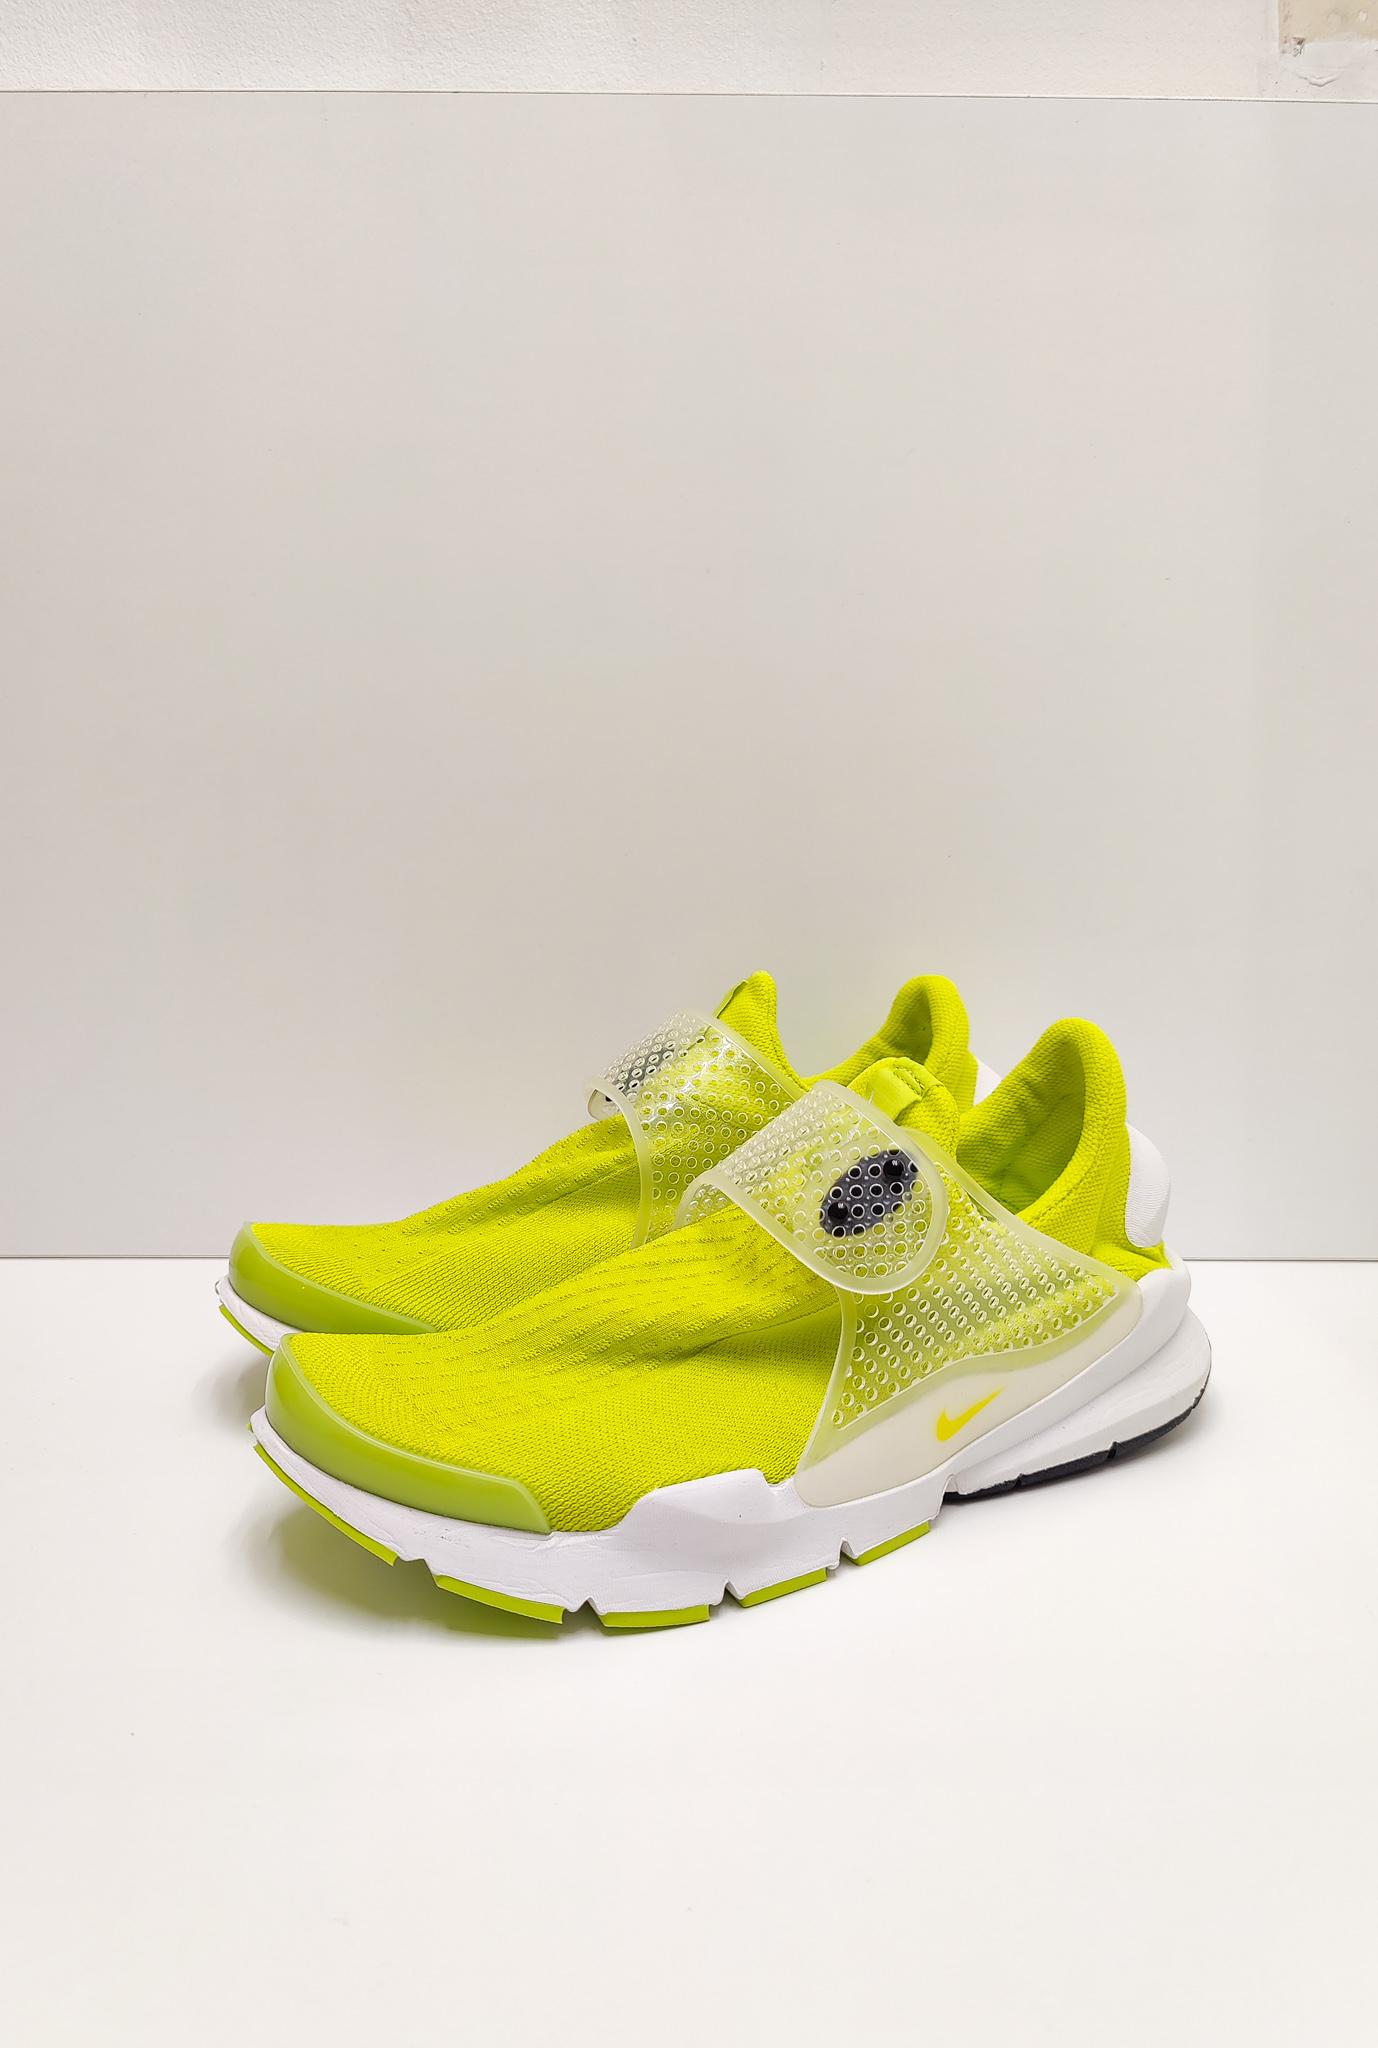 Nike Sock Dart Neon Yellow